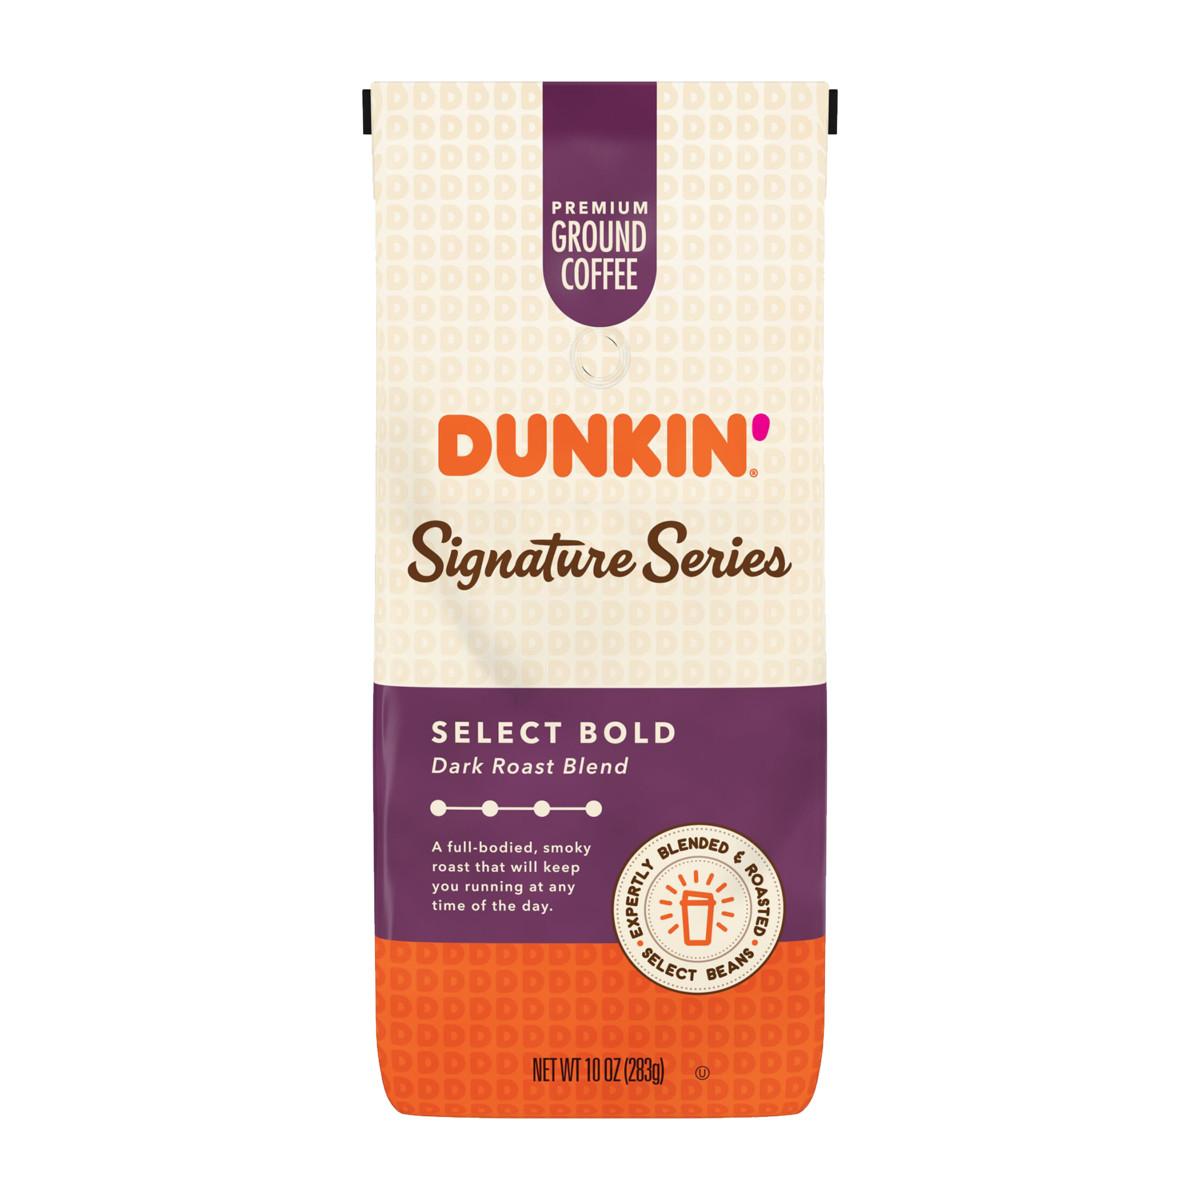 Dunkin'® Signature Series: Select Bold Dark Roast Ground Coffee